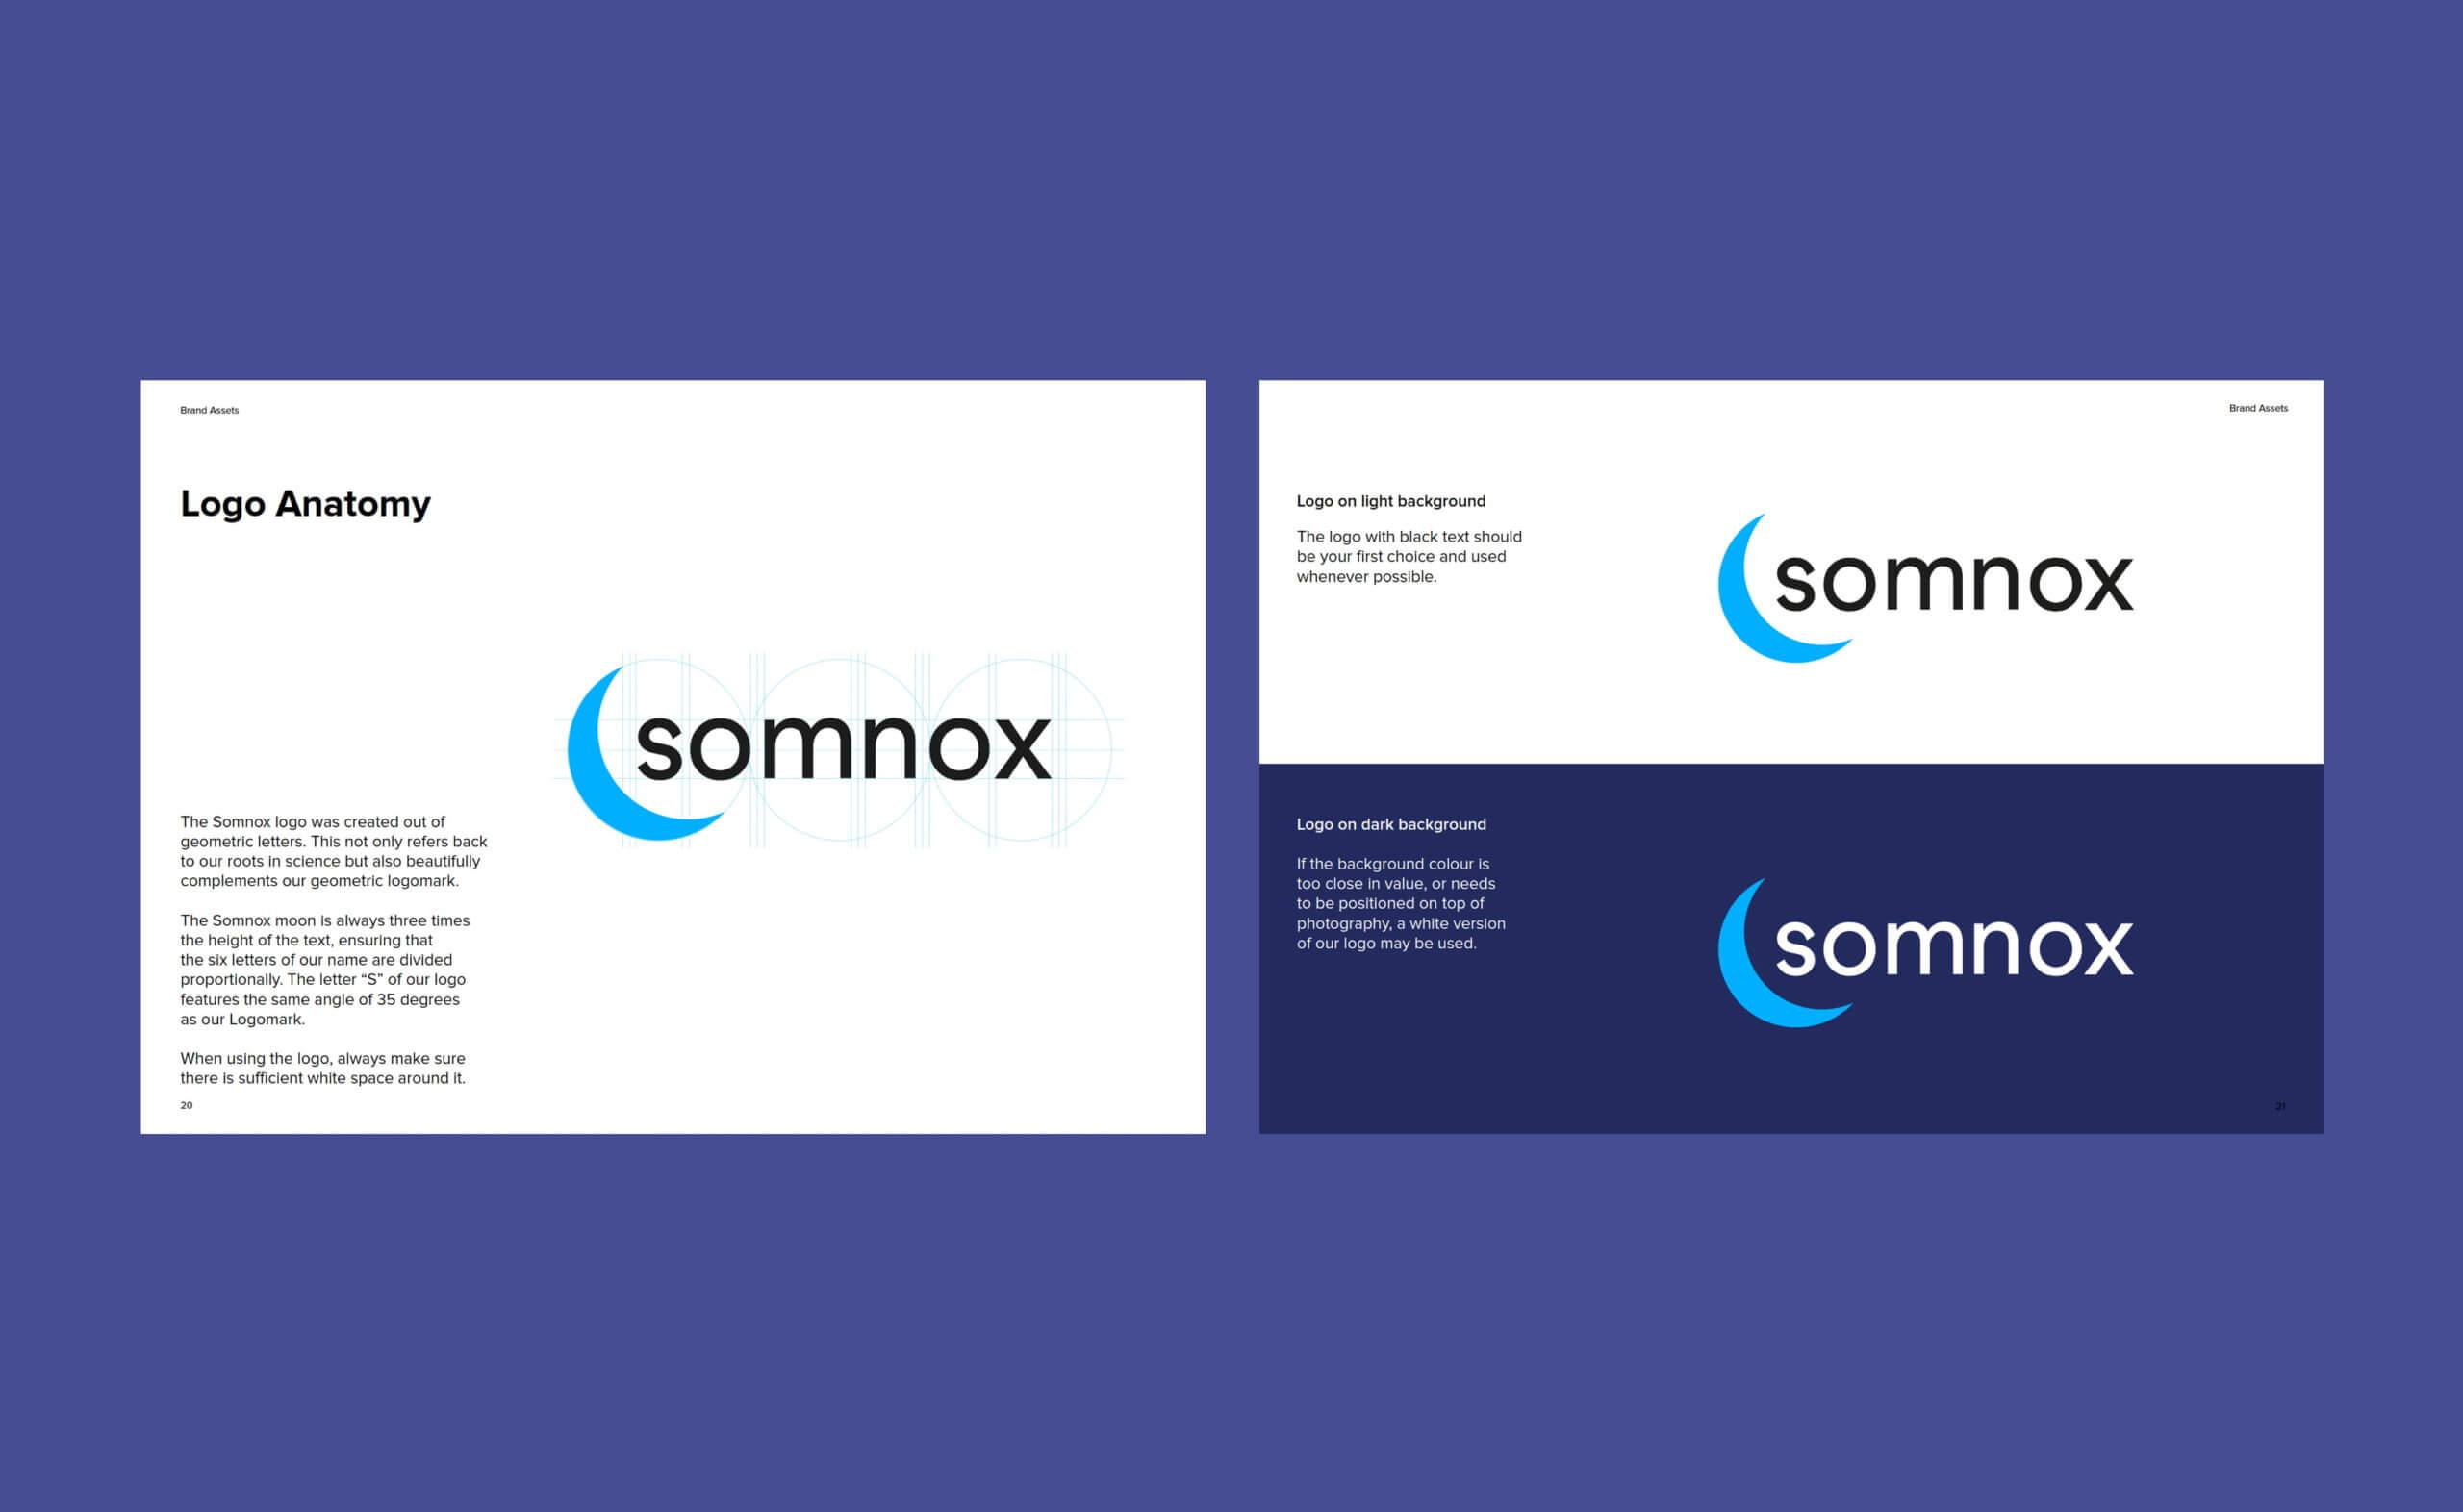 Somnox-Brand-16-2